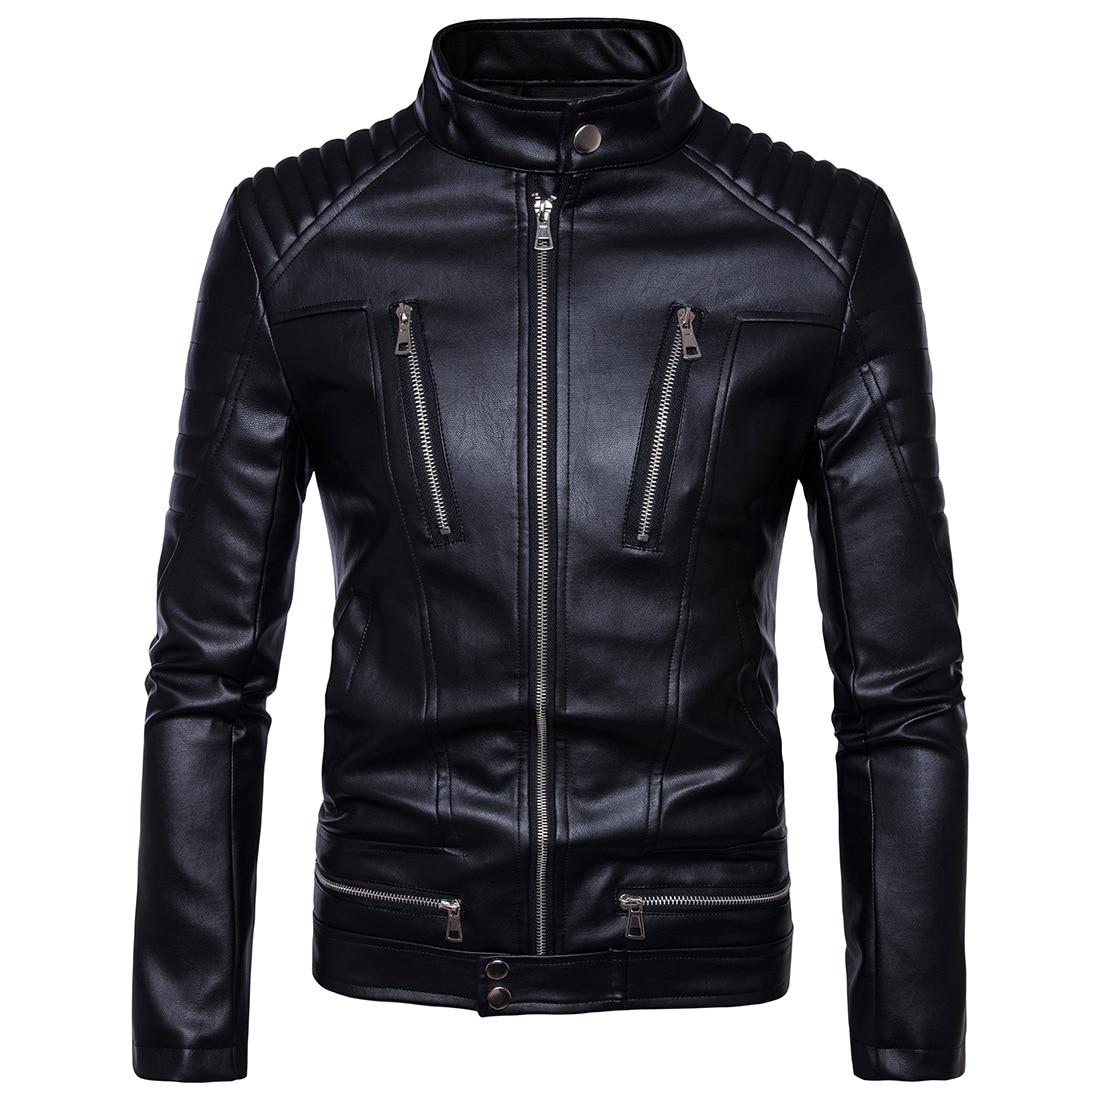 Mens punk multi zipper motorcycle Leather jacket plus PU leather clothing Male costumes jacket